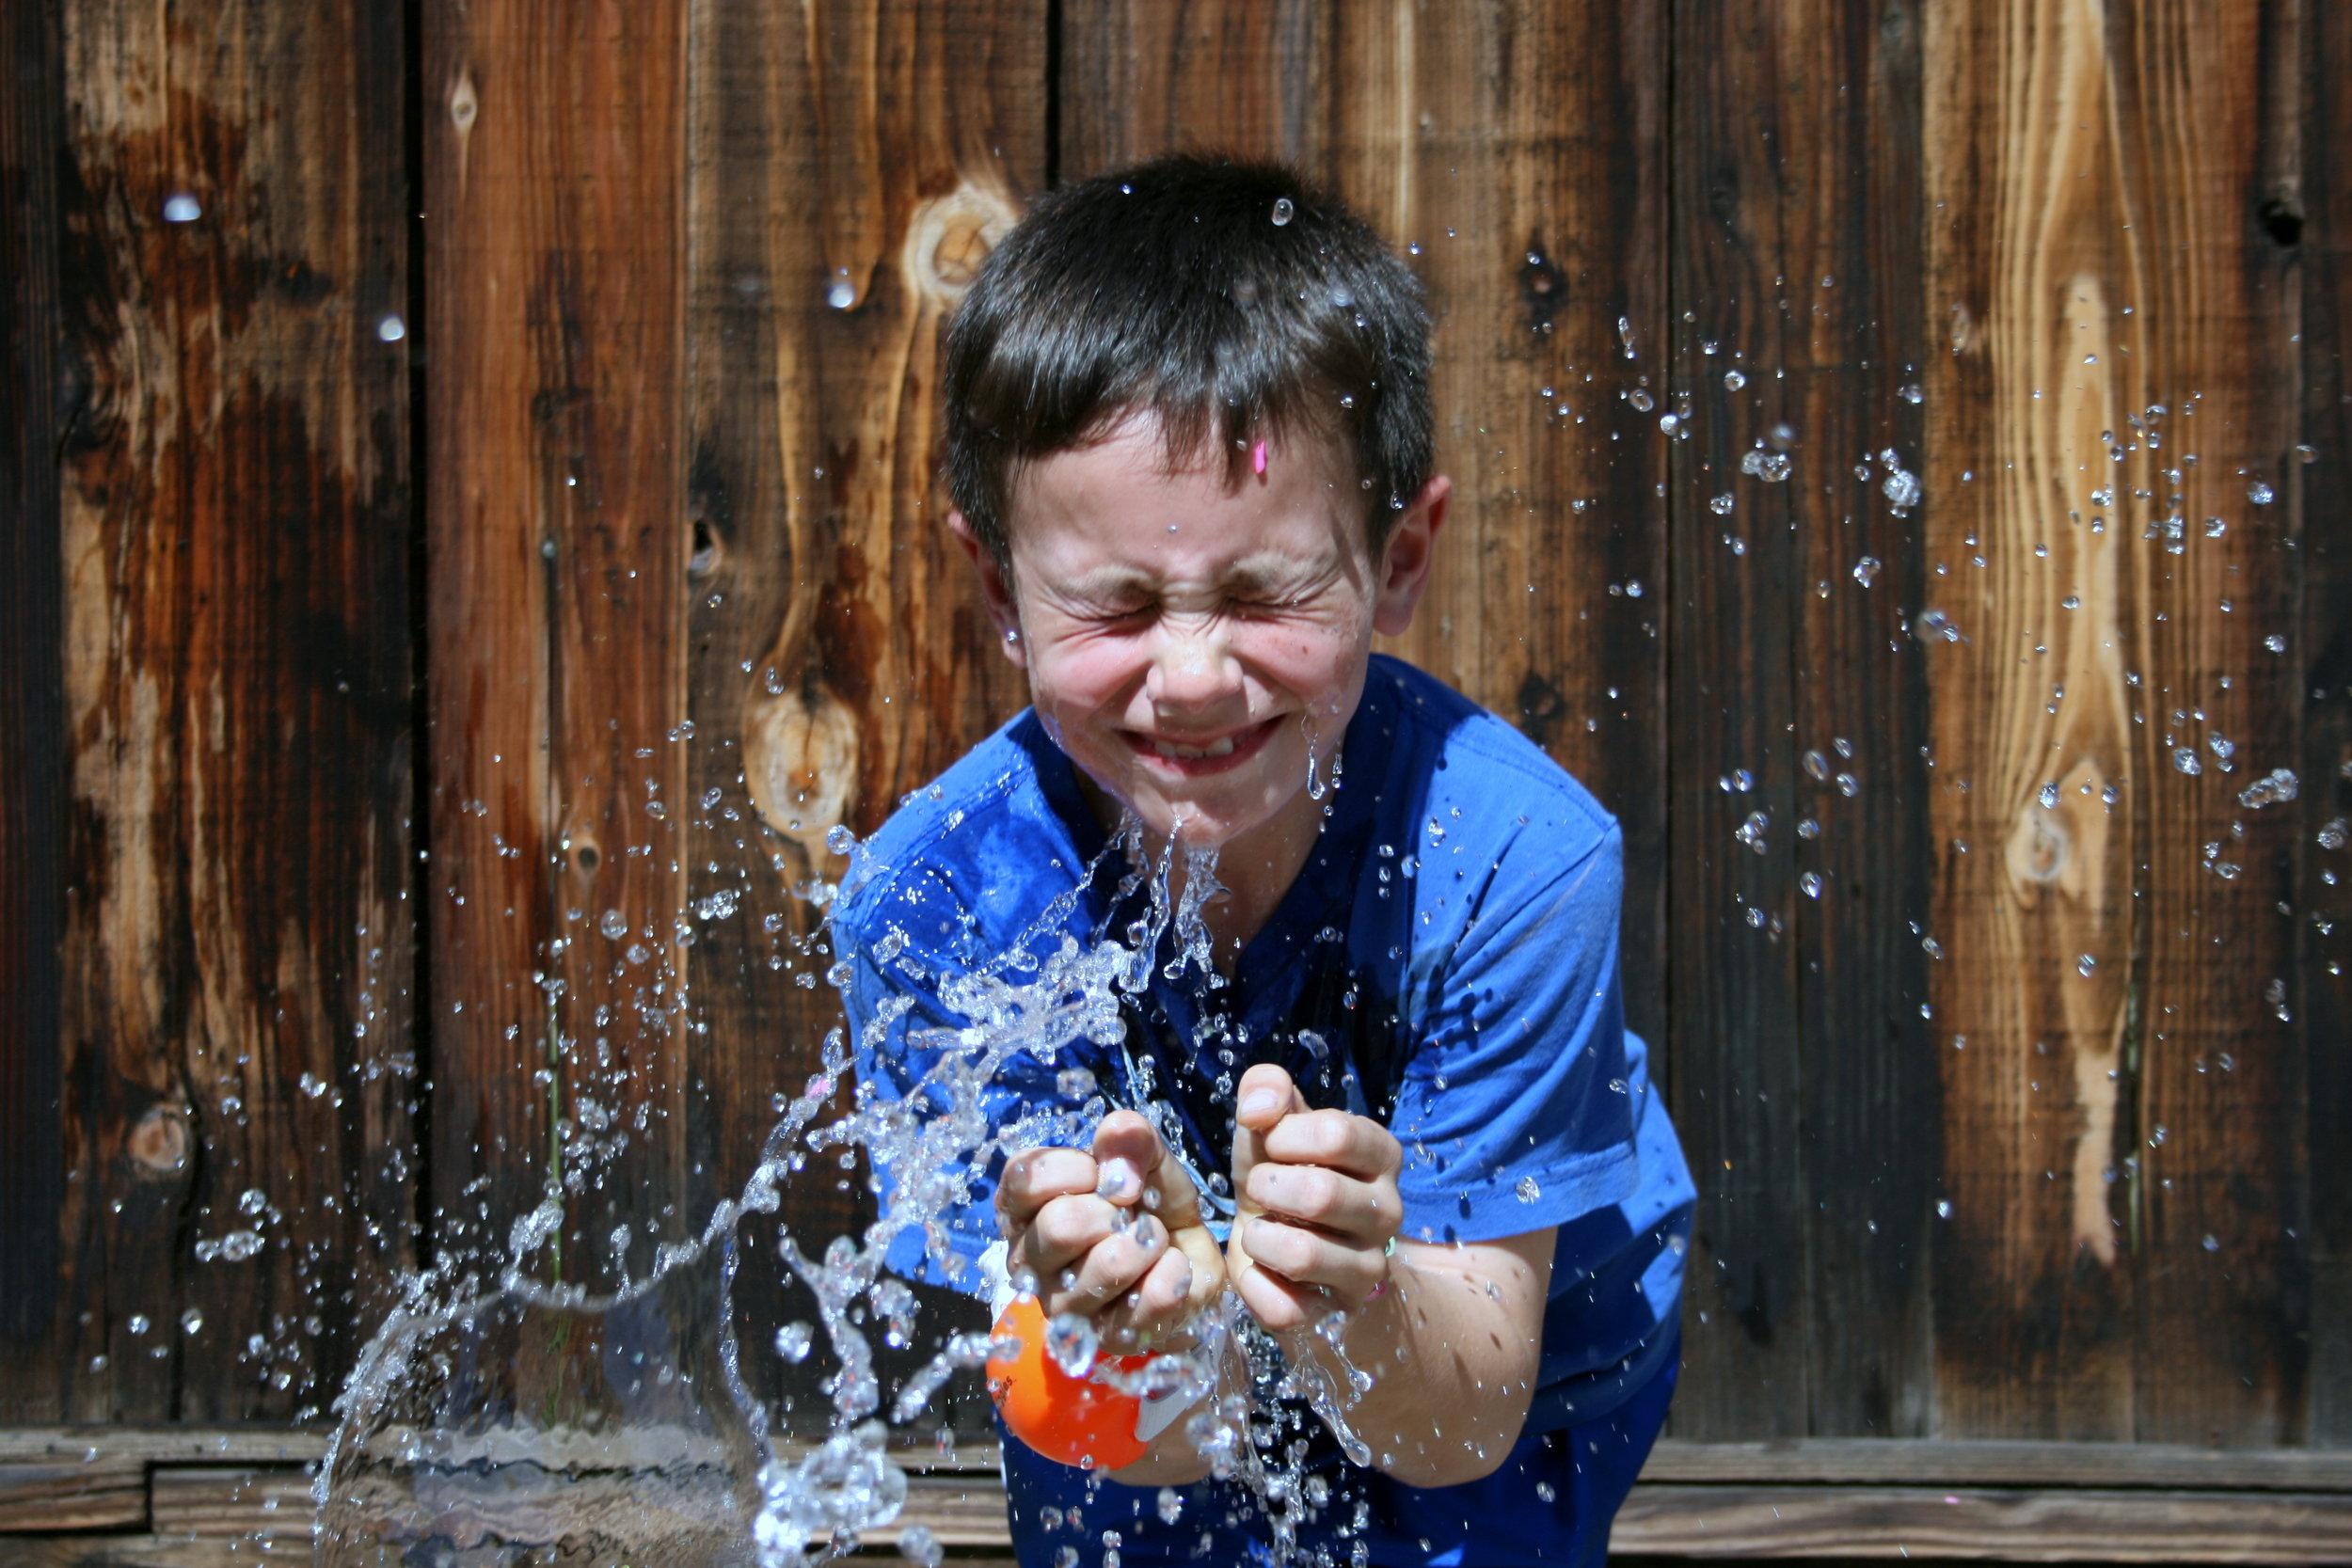 Child splashing at Alum Rock Women and Children's Center